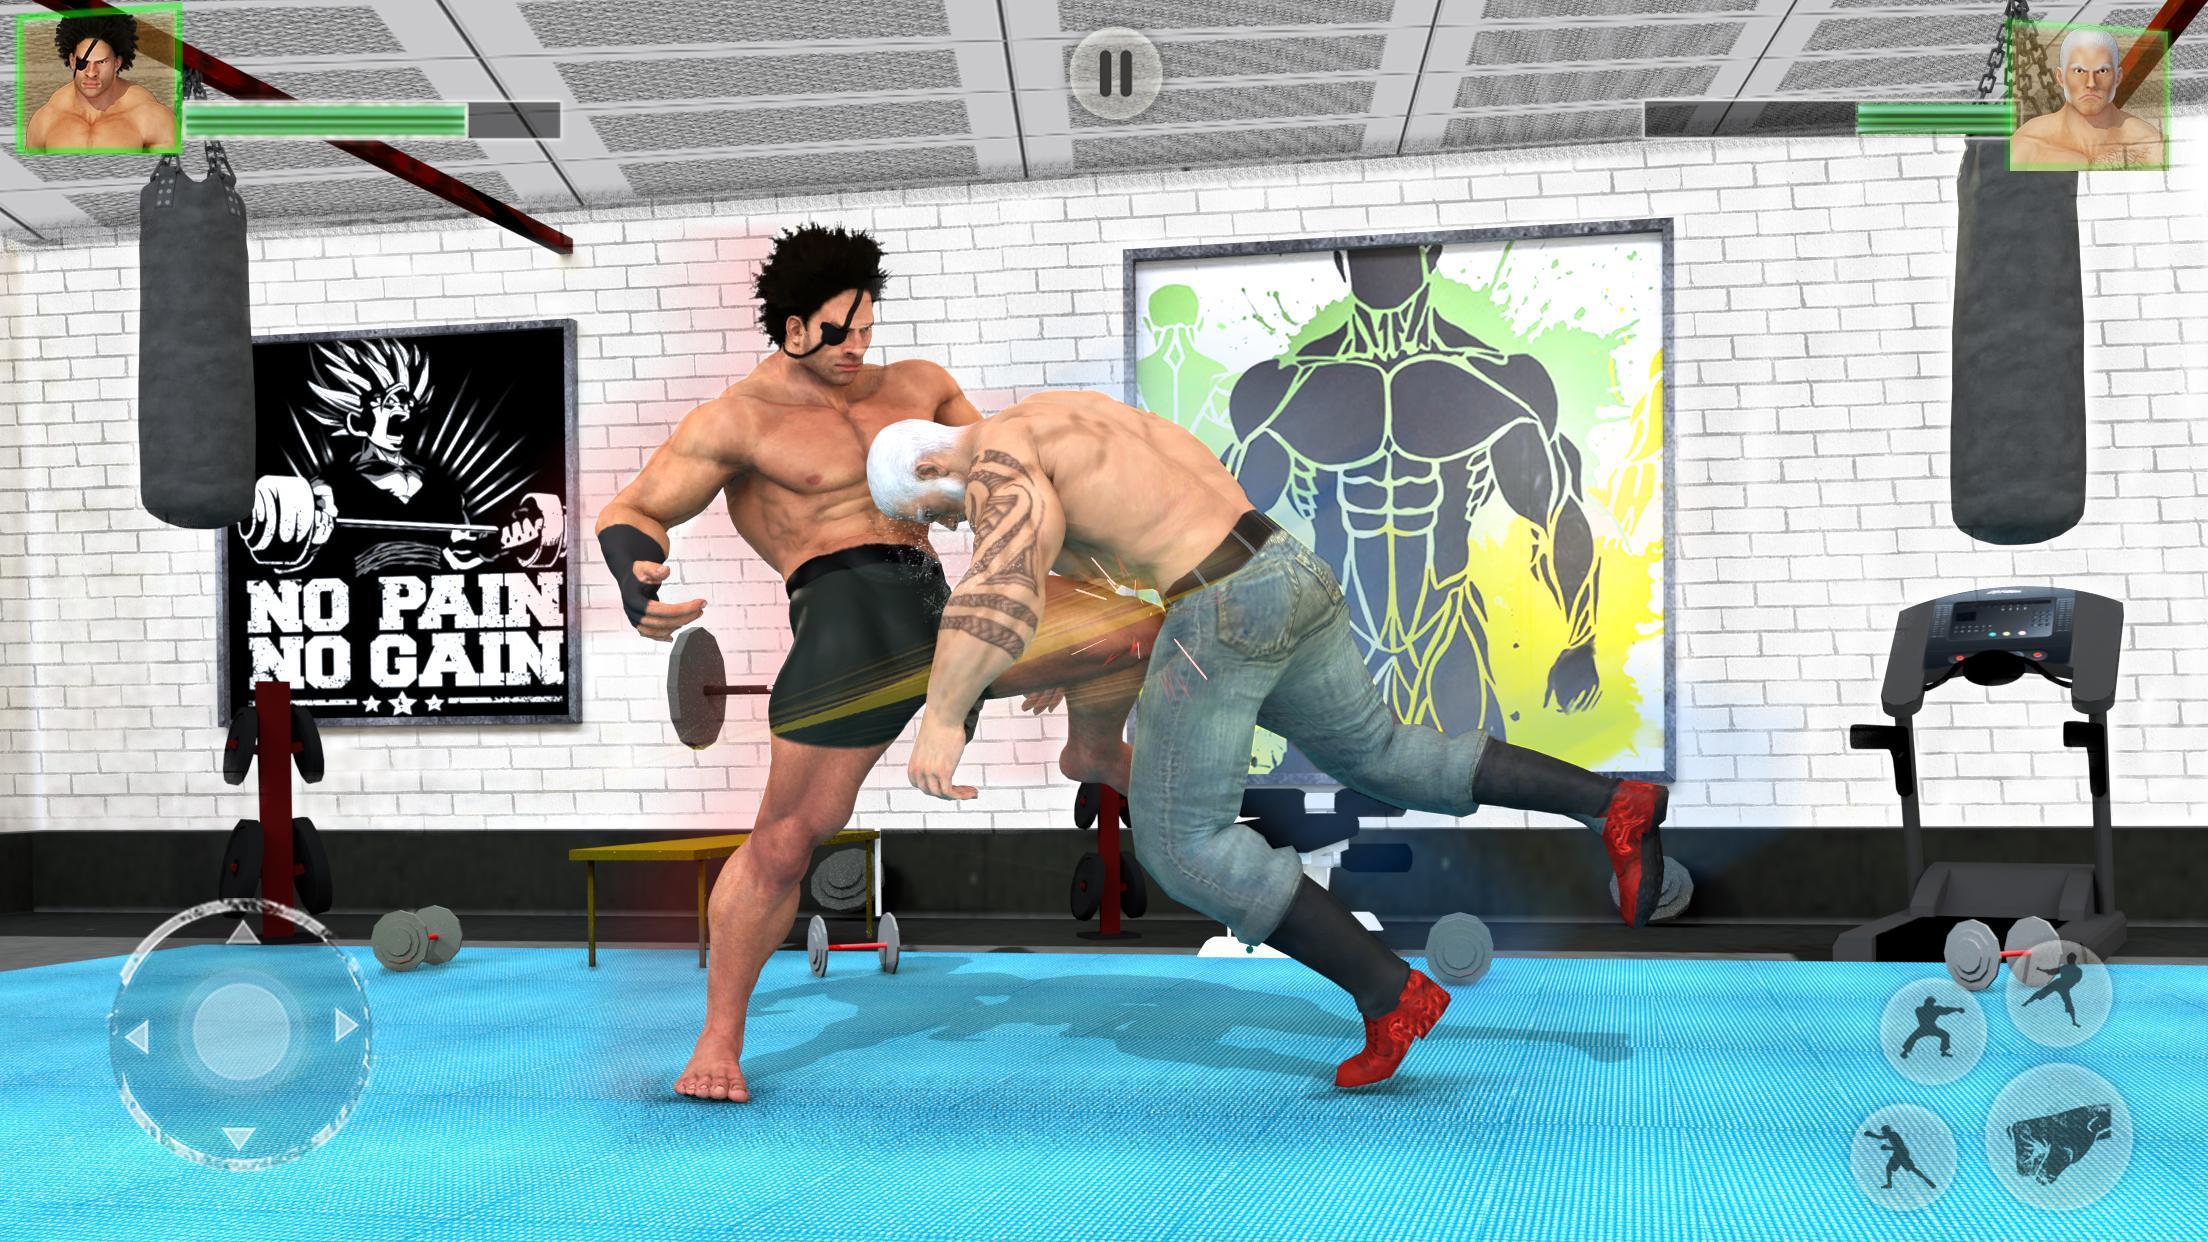 Bodybuilder Fighting Club 2019: Wrestling Games 1.1.4 Screenshot 3